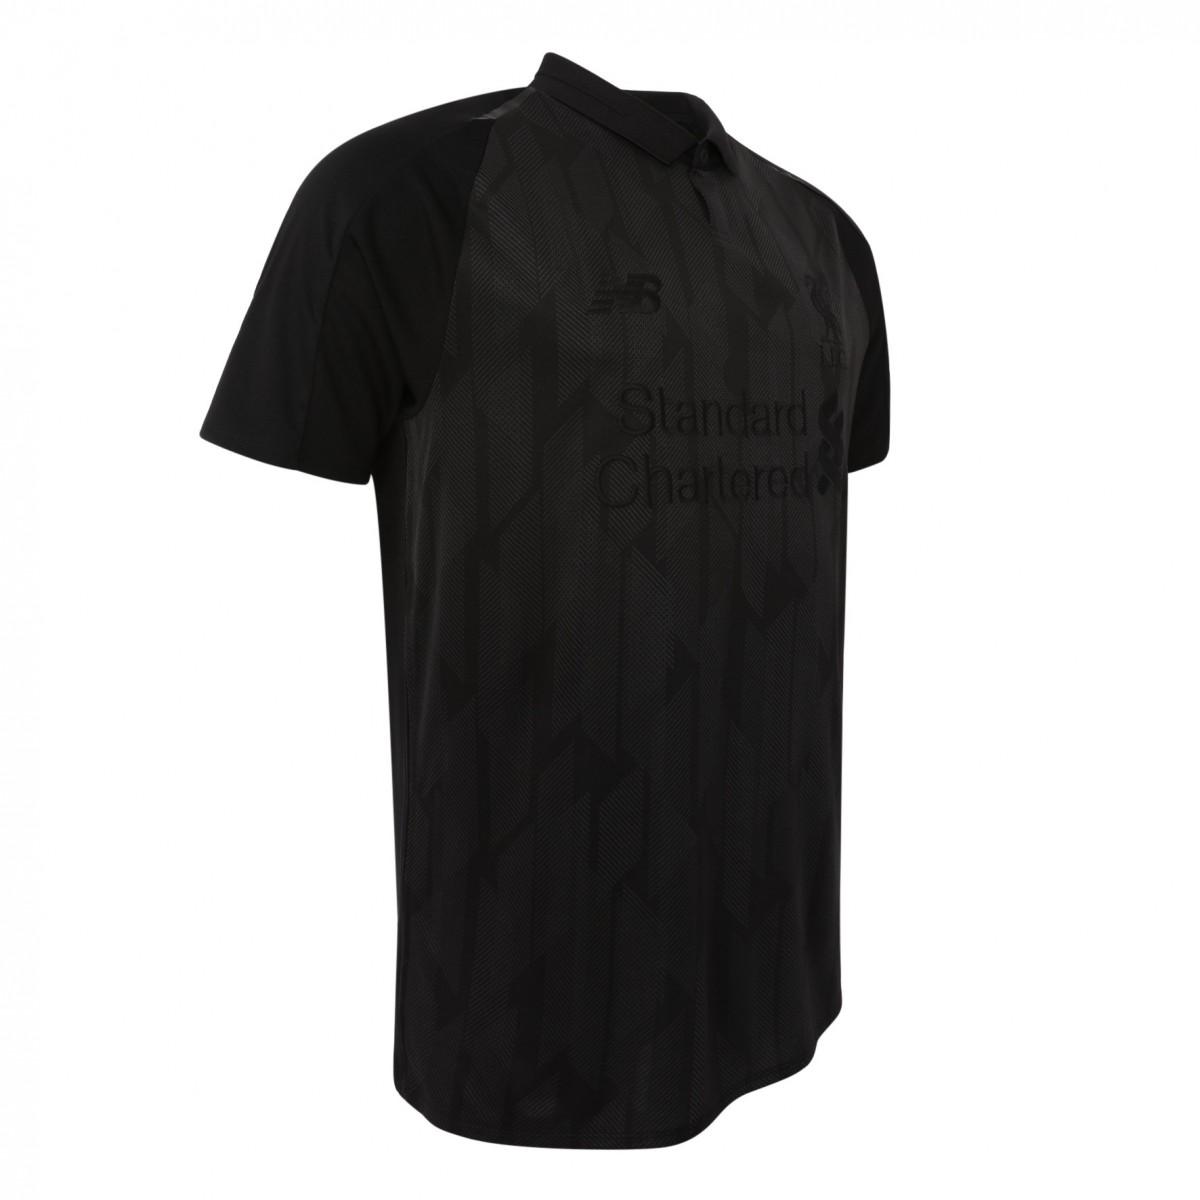 9e520398c9f5e Liverpool Polo Shirt Sports Direct | Azərbaycan Dillər Universiteti